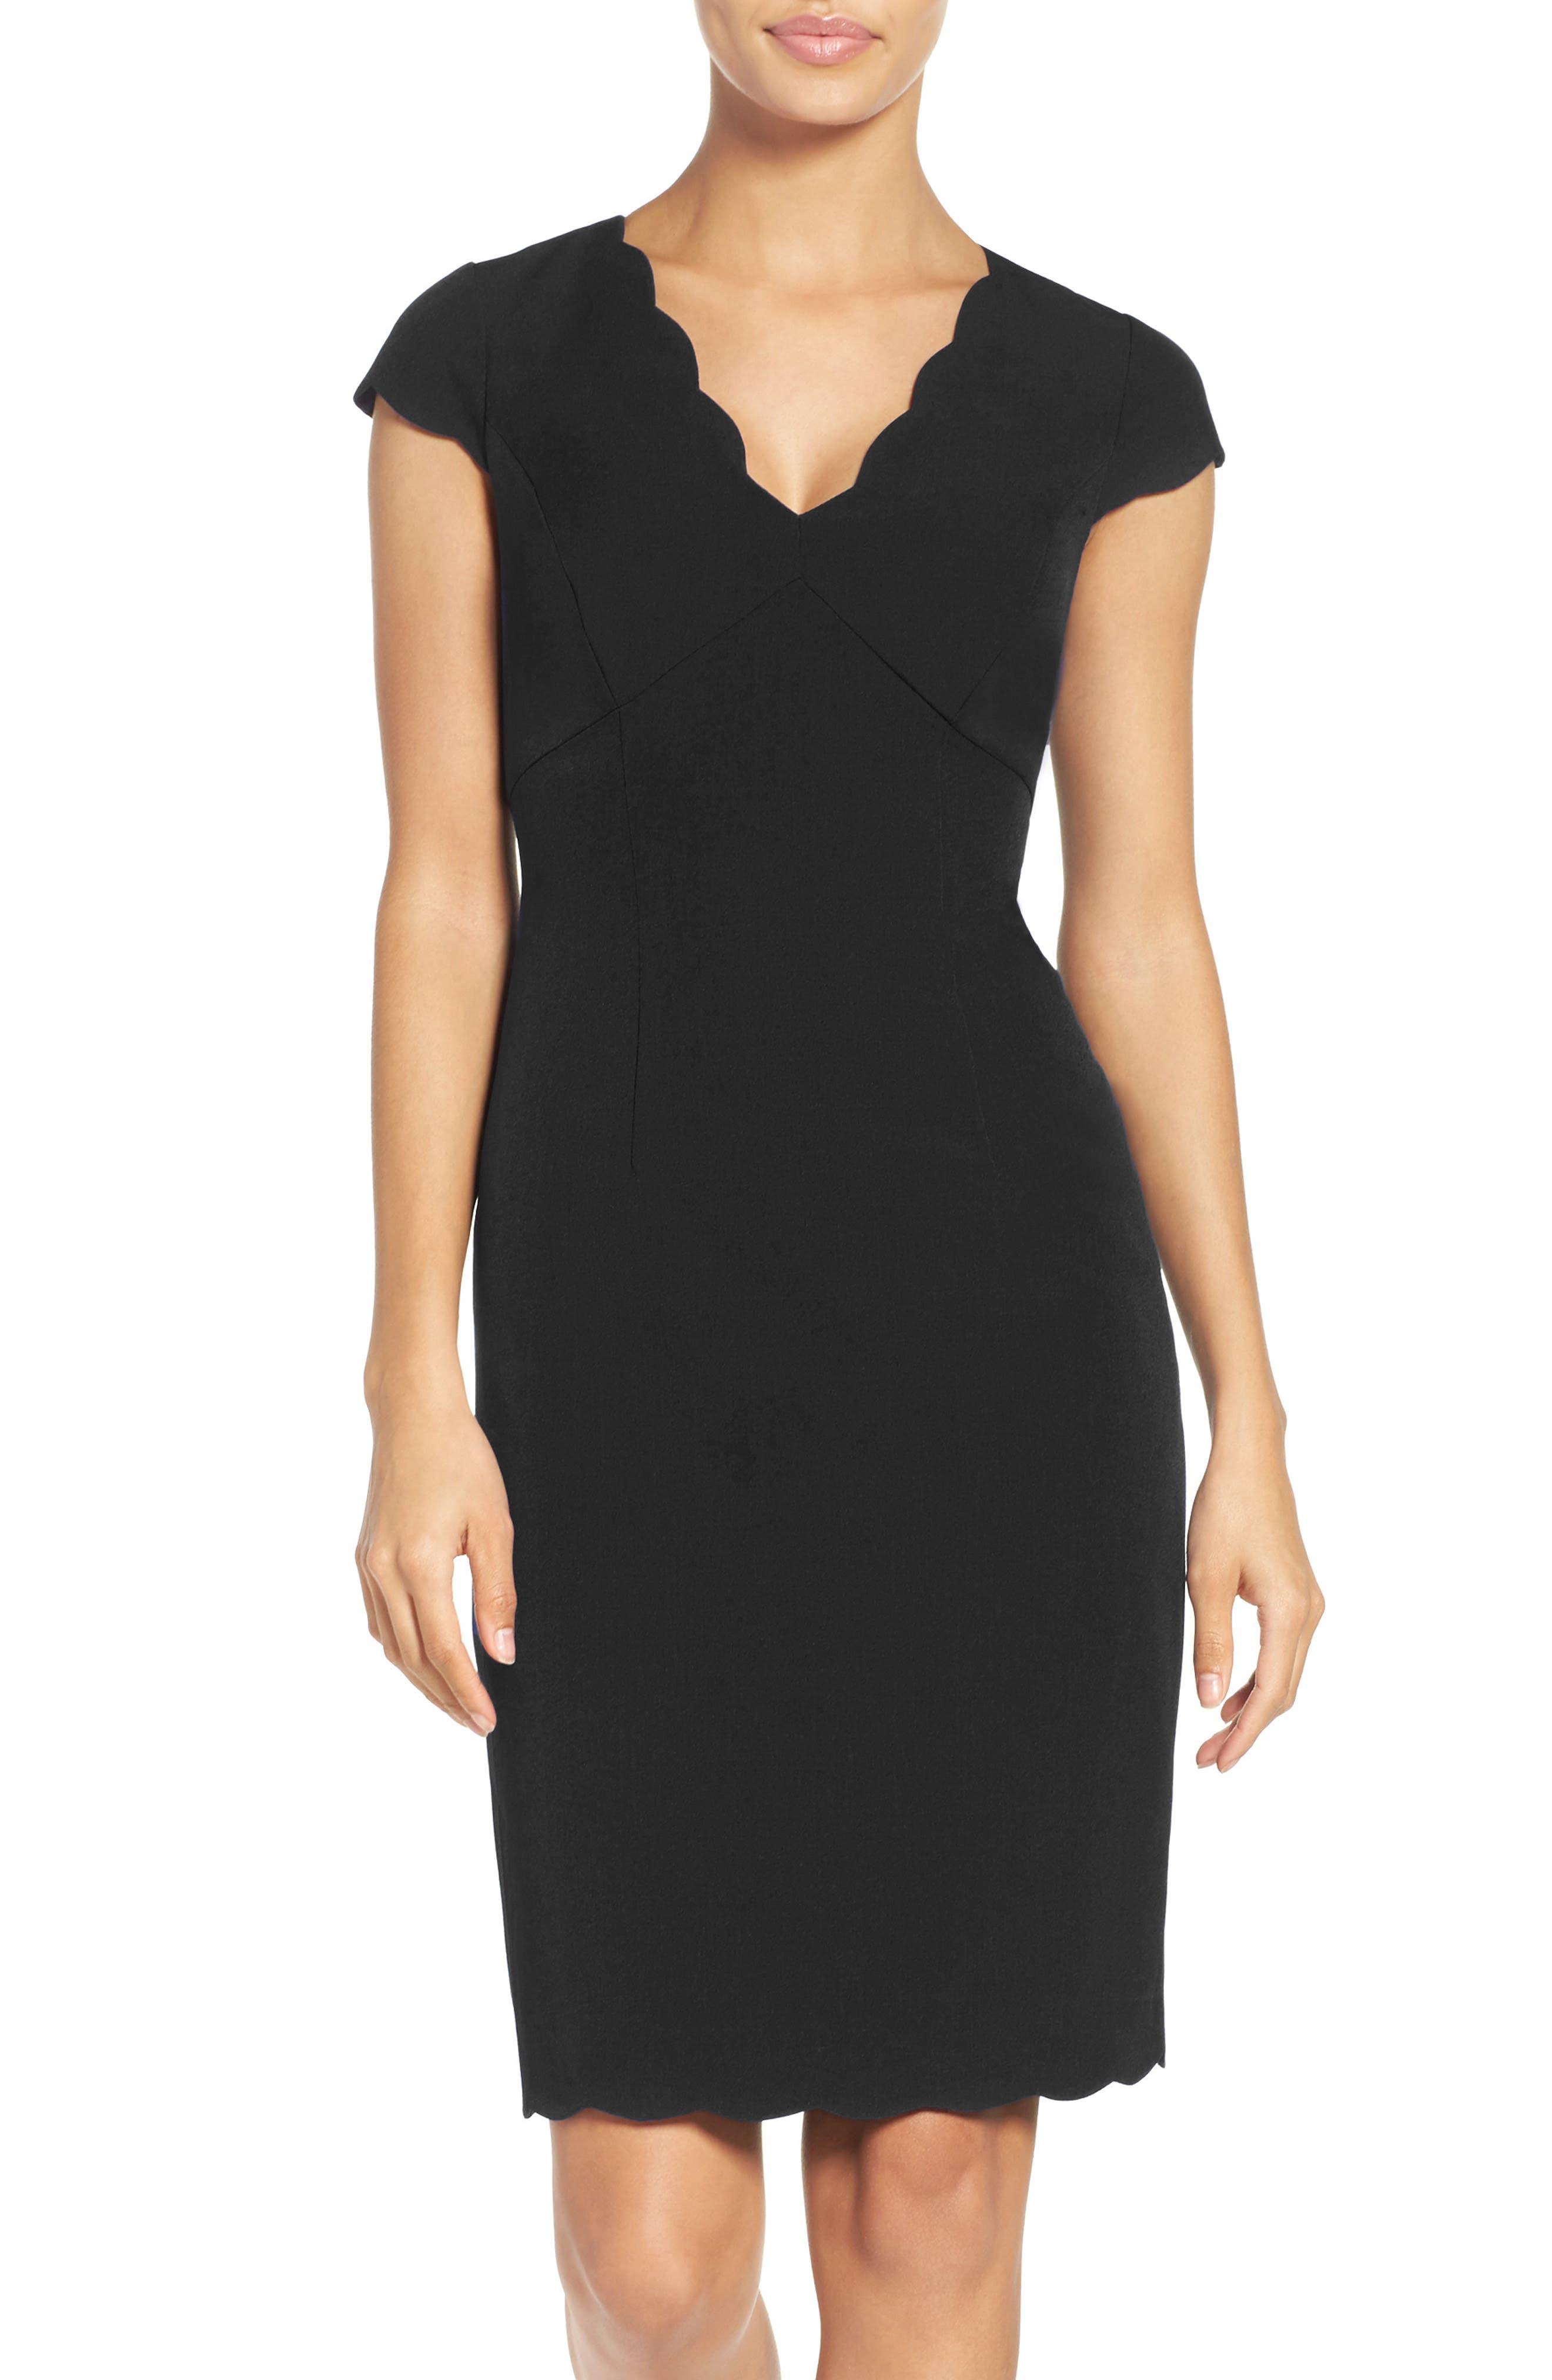 ADRIANNA PAPELL,                             Scalloped Crepe Sheath Dress,                             Alternate thumbnail 5, color,                             001